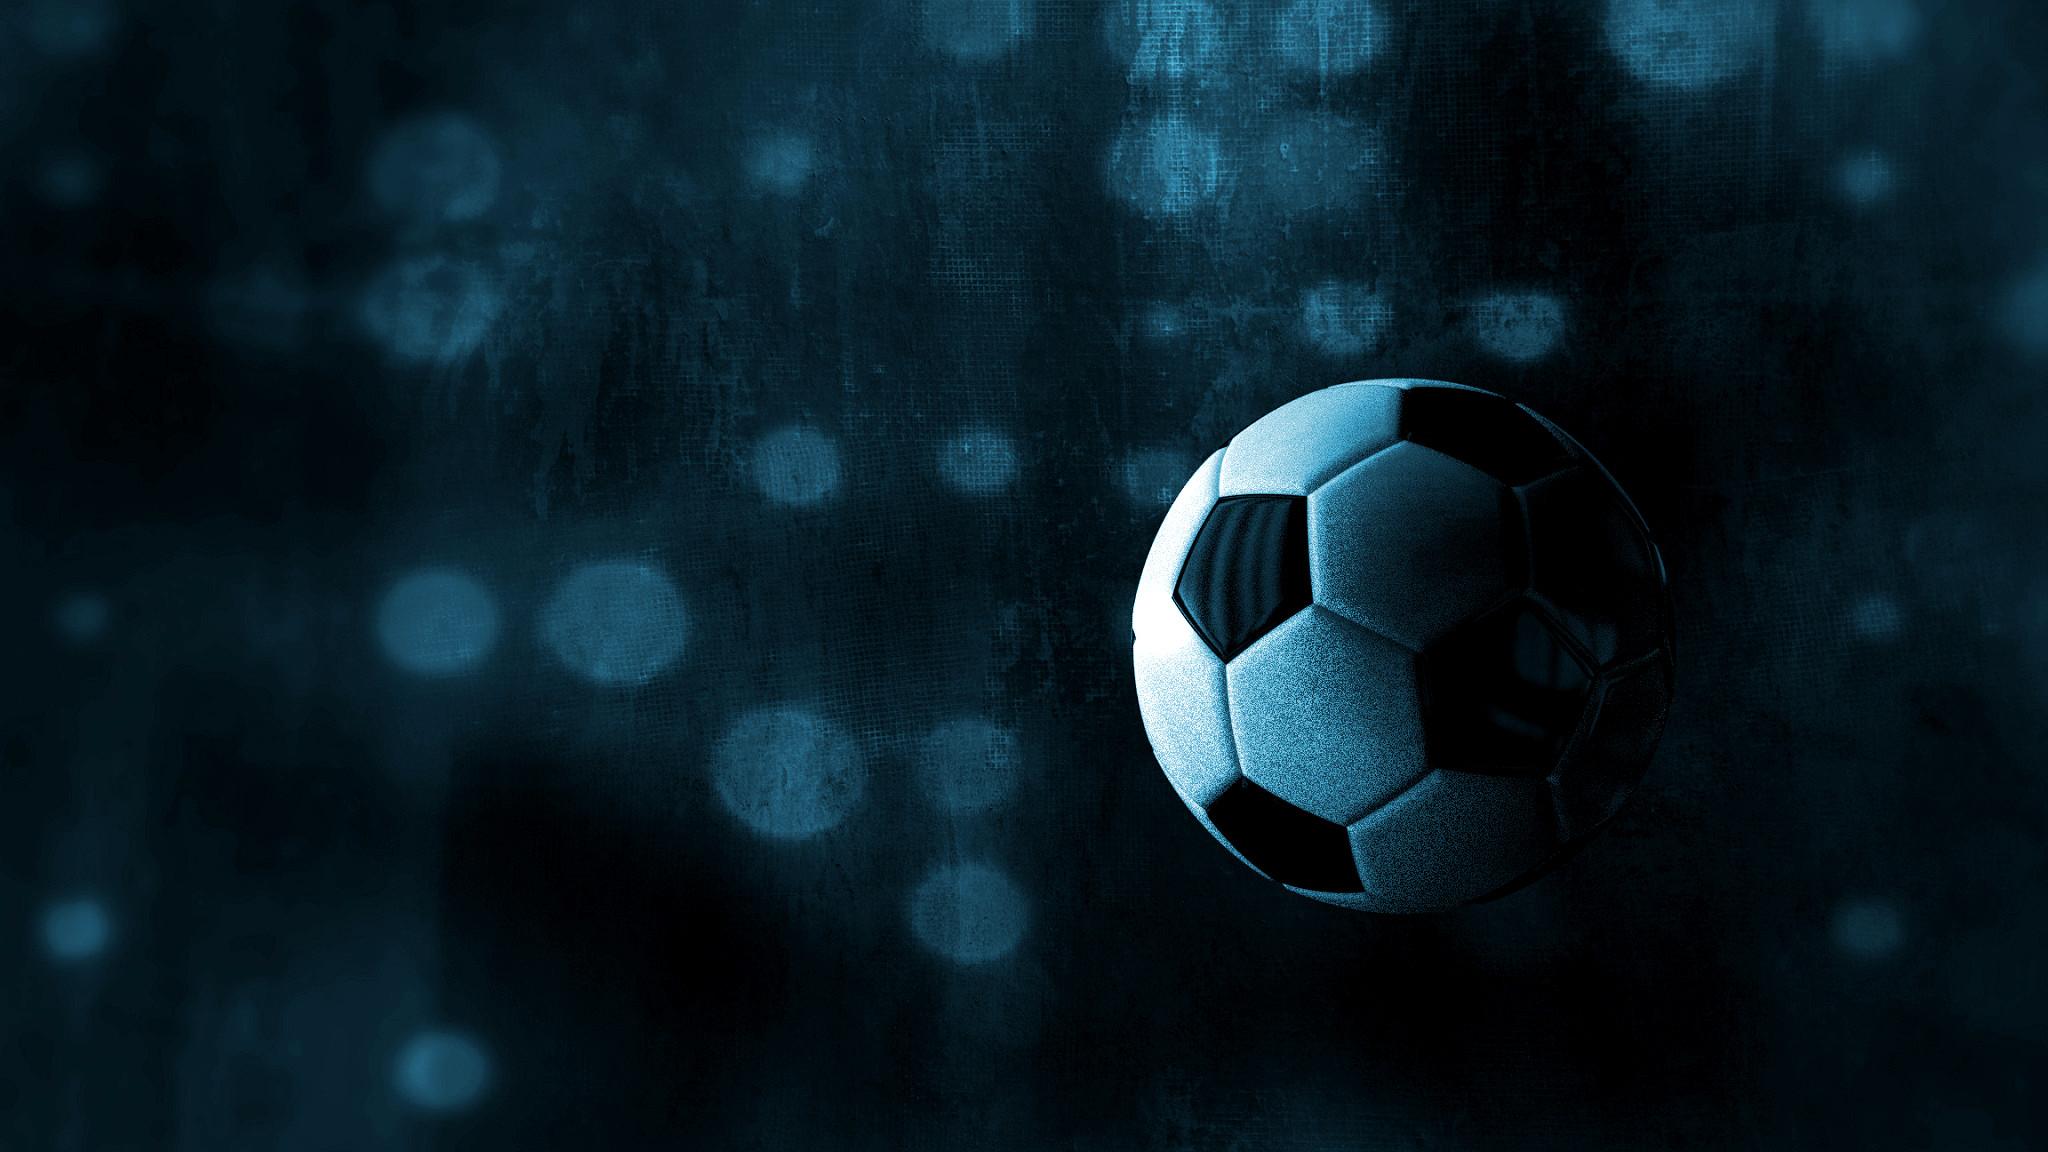 soccer desktop wallpaper 73898